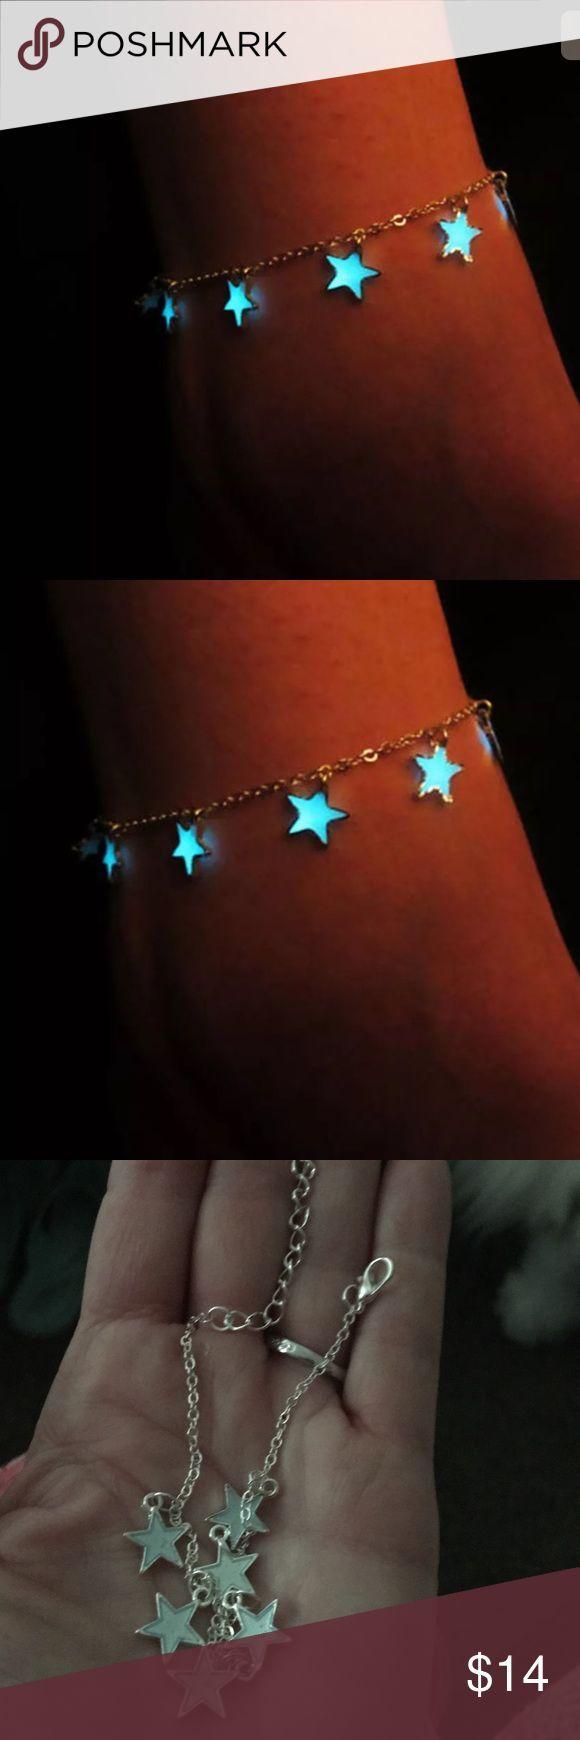 GLOW IN THE DARK STA  GLOW IN THE DARK STAR SILVER ANKLET, NWT Jewelry